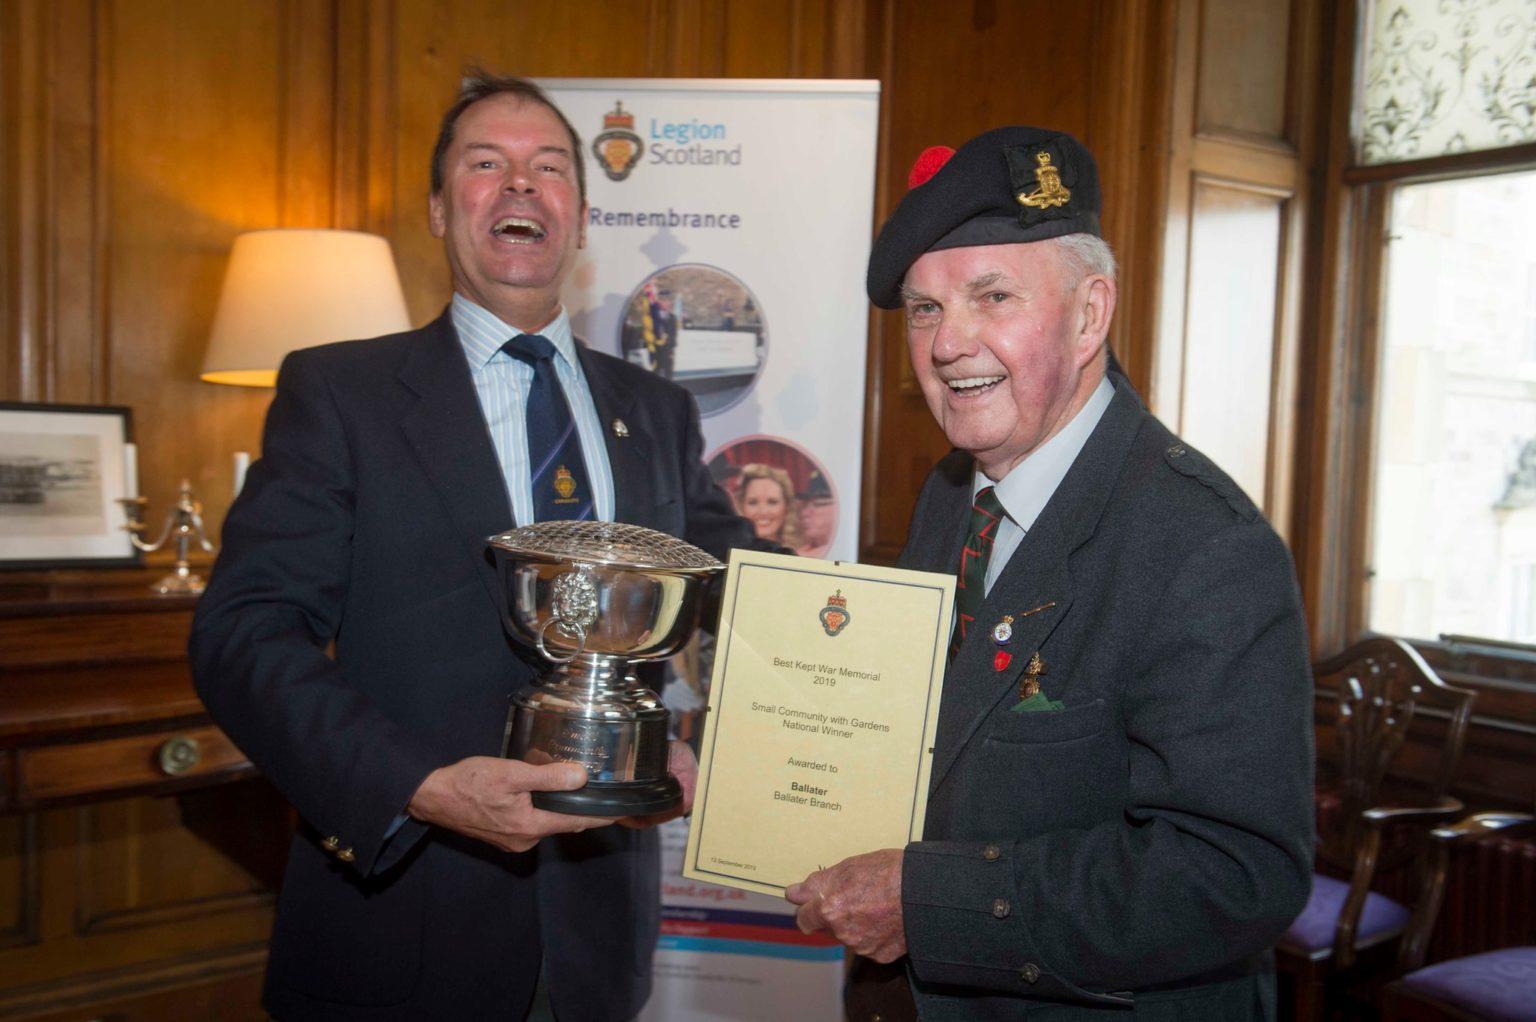 Mr Inkster with Davie Paton from Legion Scotland